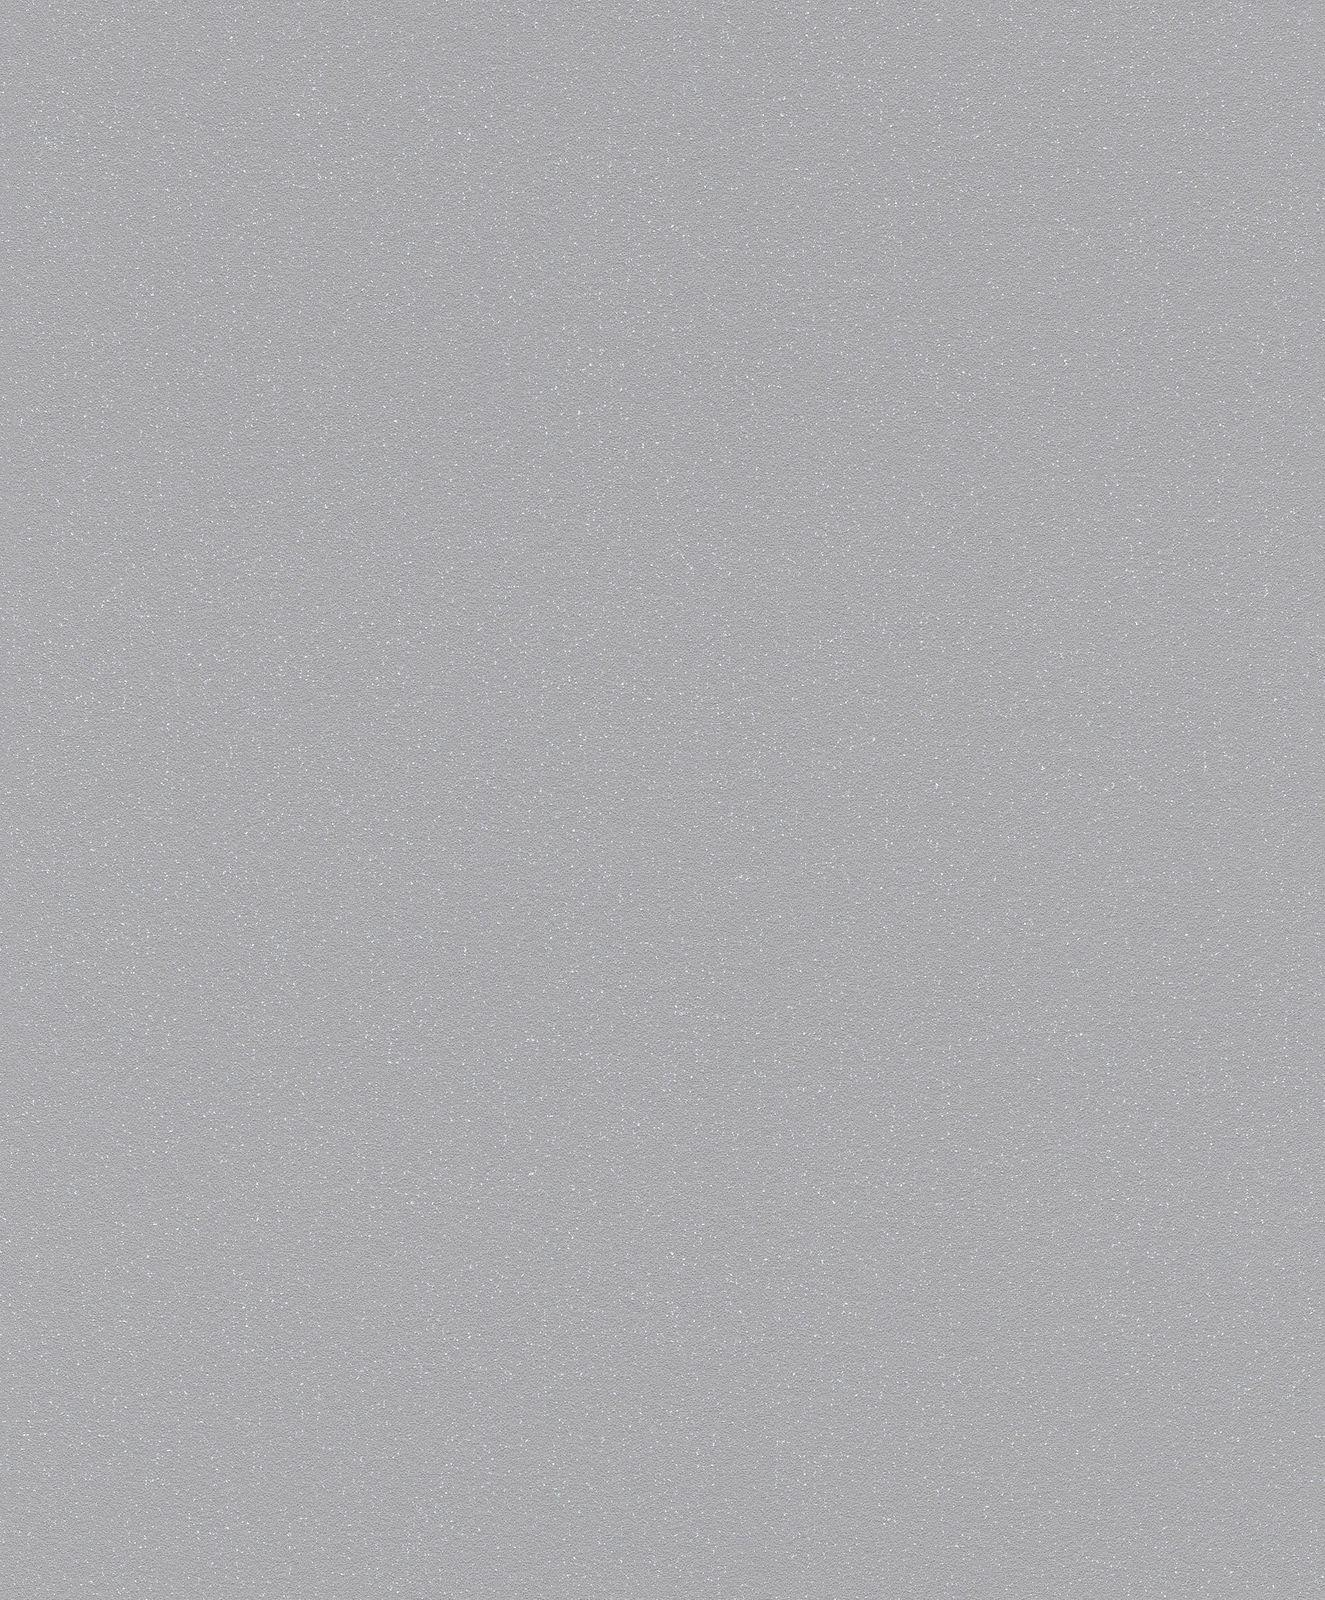 vliestapete rasch flitter grau silber glitzer 523164. Black Bedroom Furniture Sets. Home Design Ideas